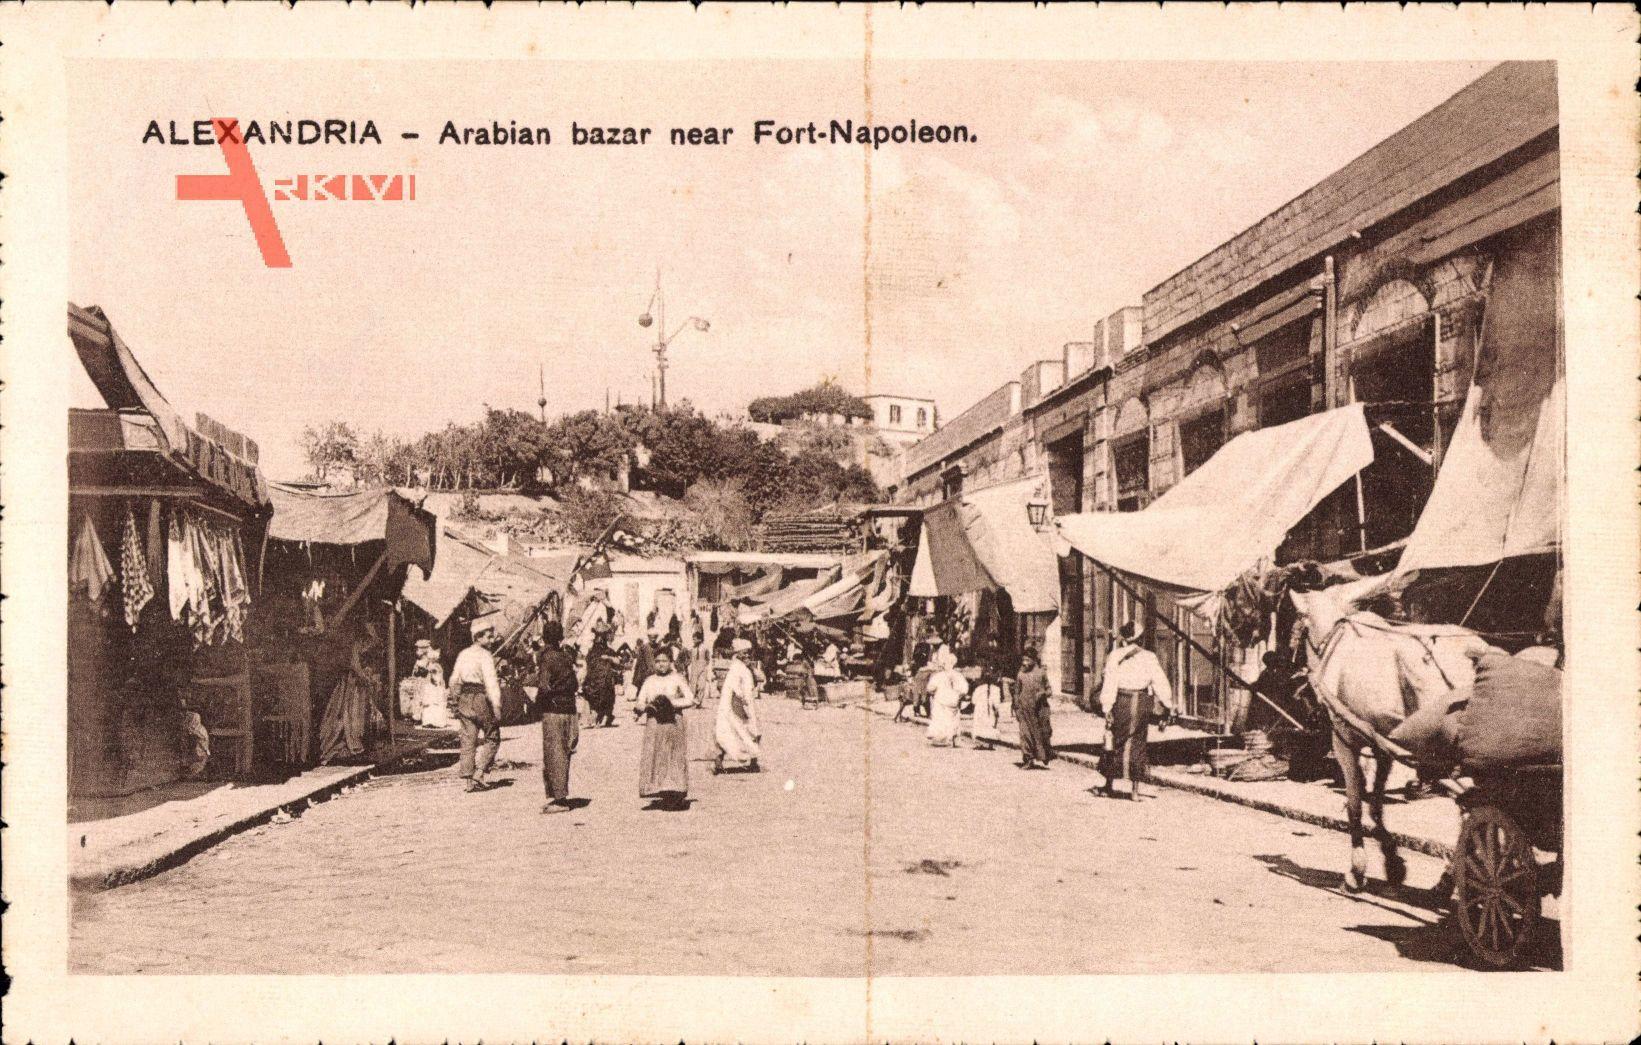 Alexandria Ägypten, Arabian bazar near Fort Napoleon, Geschäfte, Straße